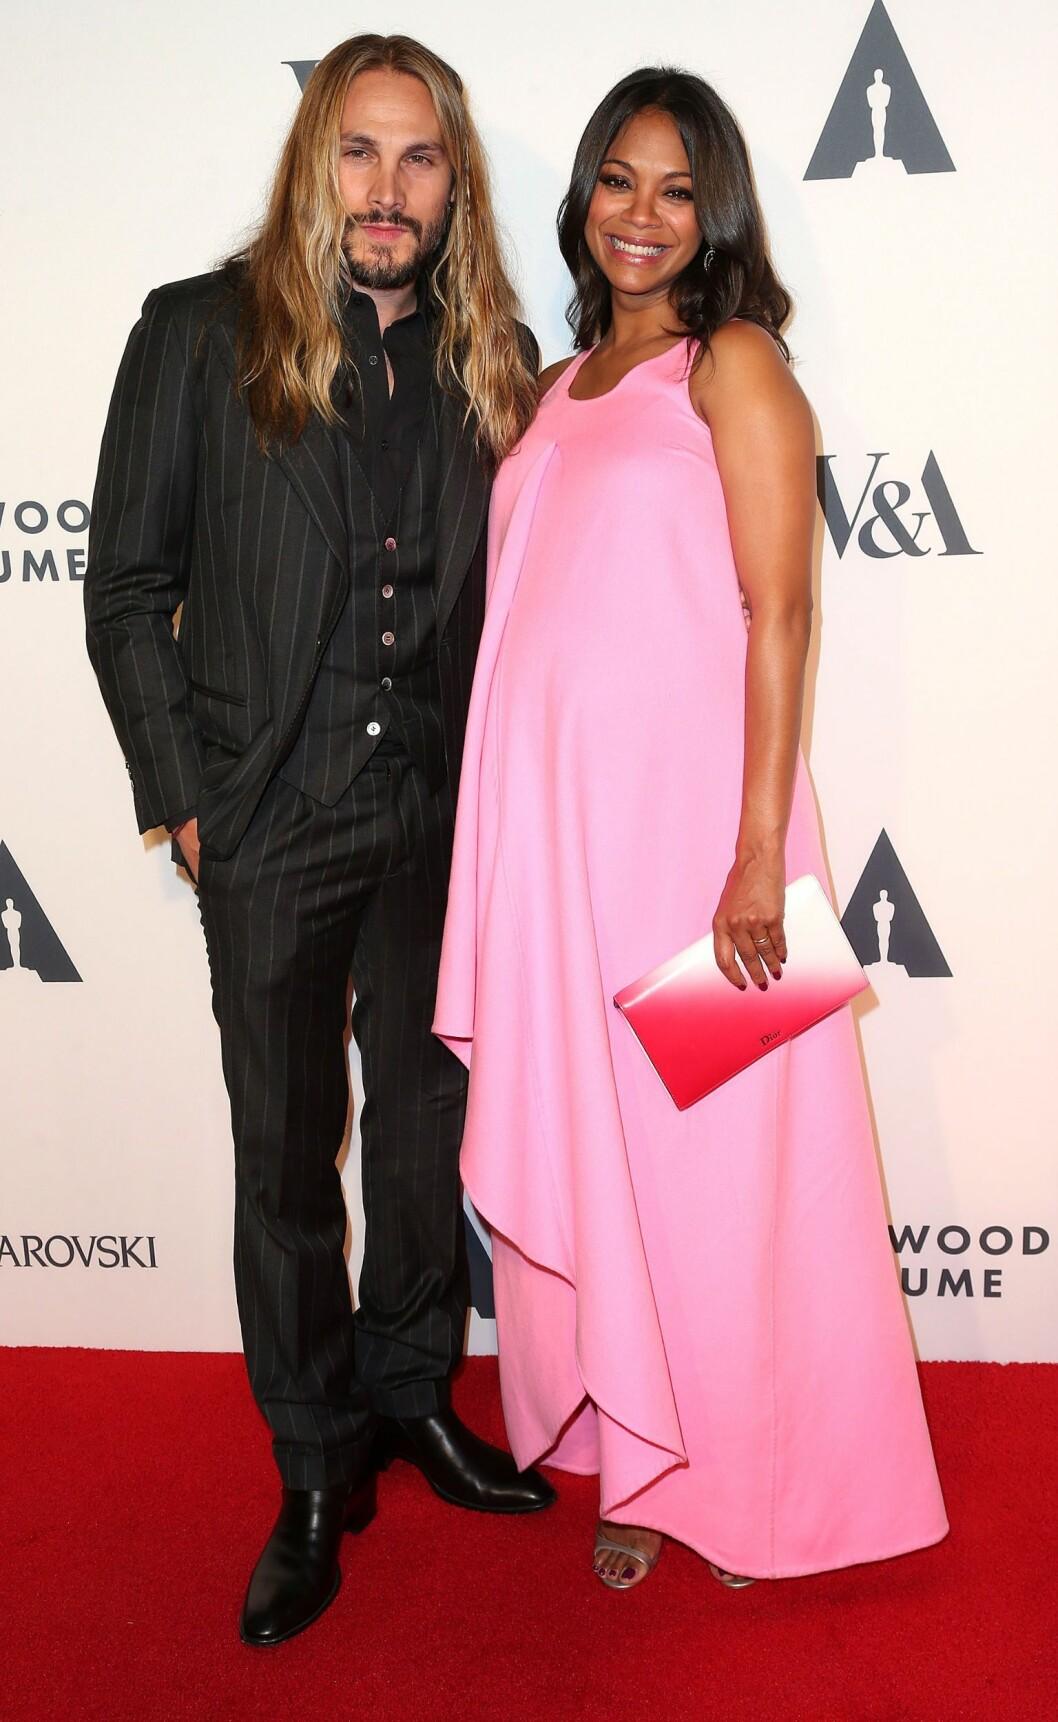 VISTE BABYMAGEN: I oktober i fjor dukket en høygravid Saldana opp på et event i Hollywood sammen med sin italienske ektemann. Foto: NTB Scanpix